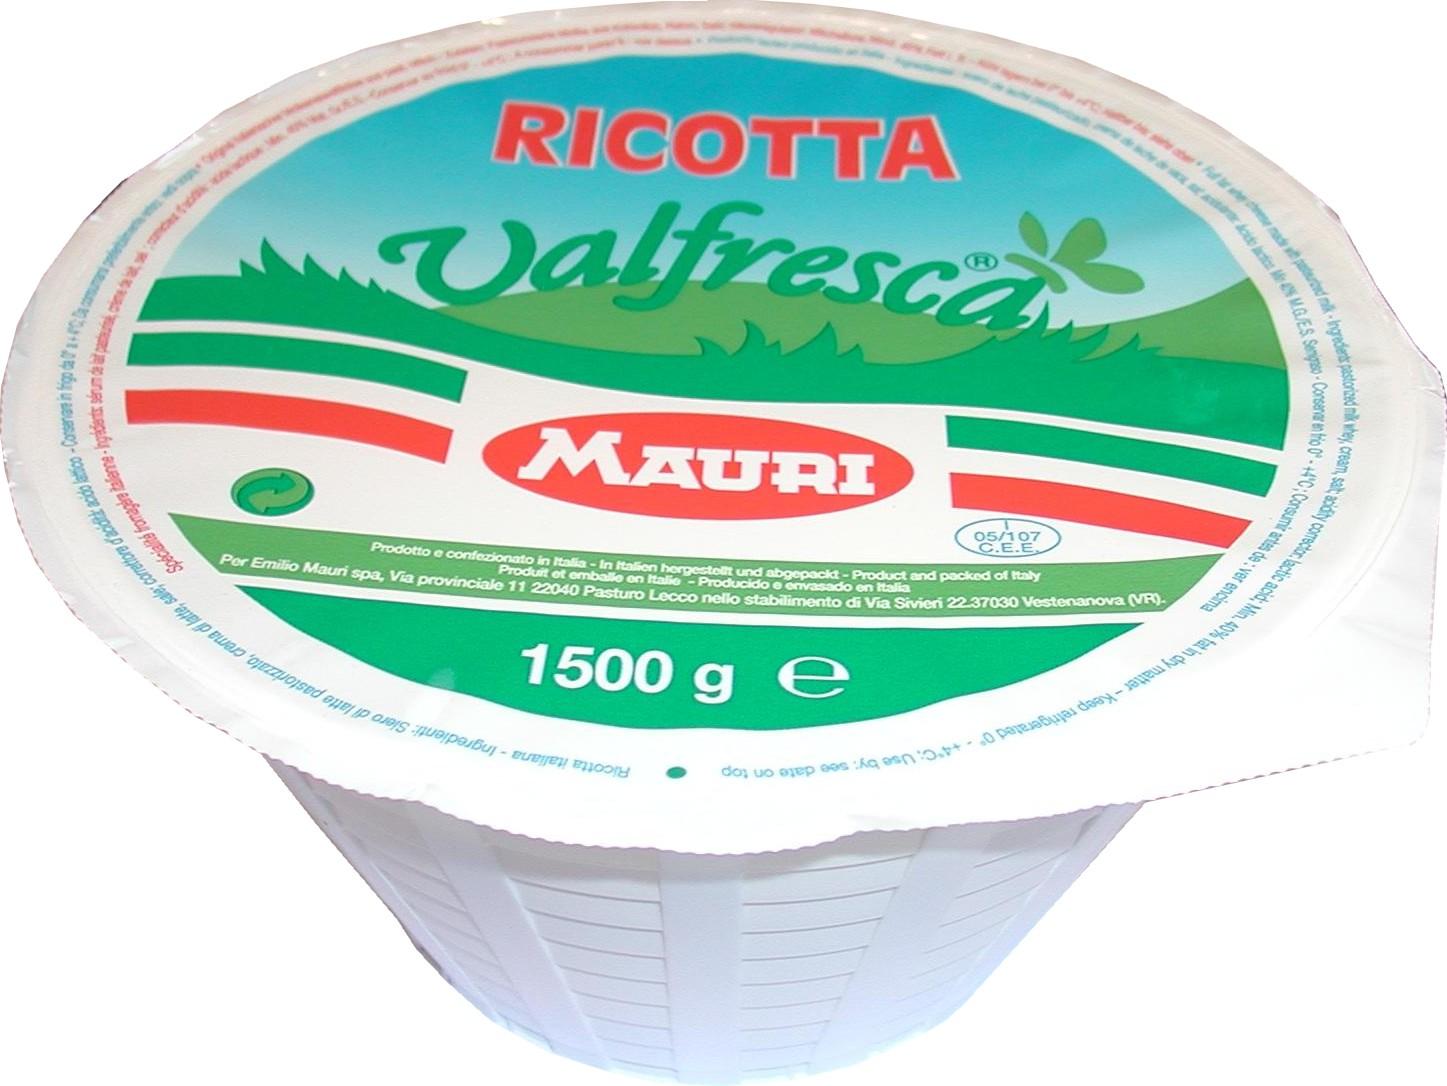 Mauri Ricotta